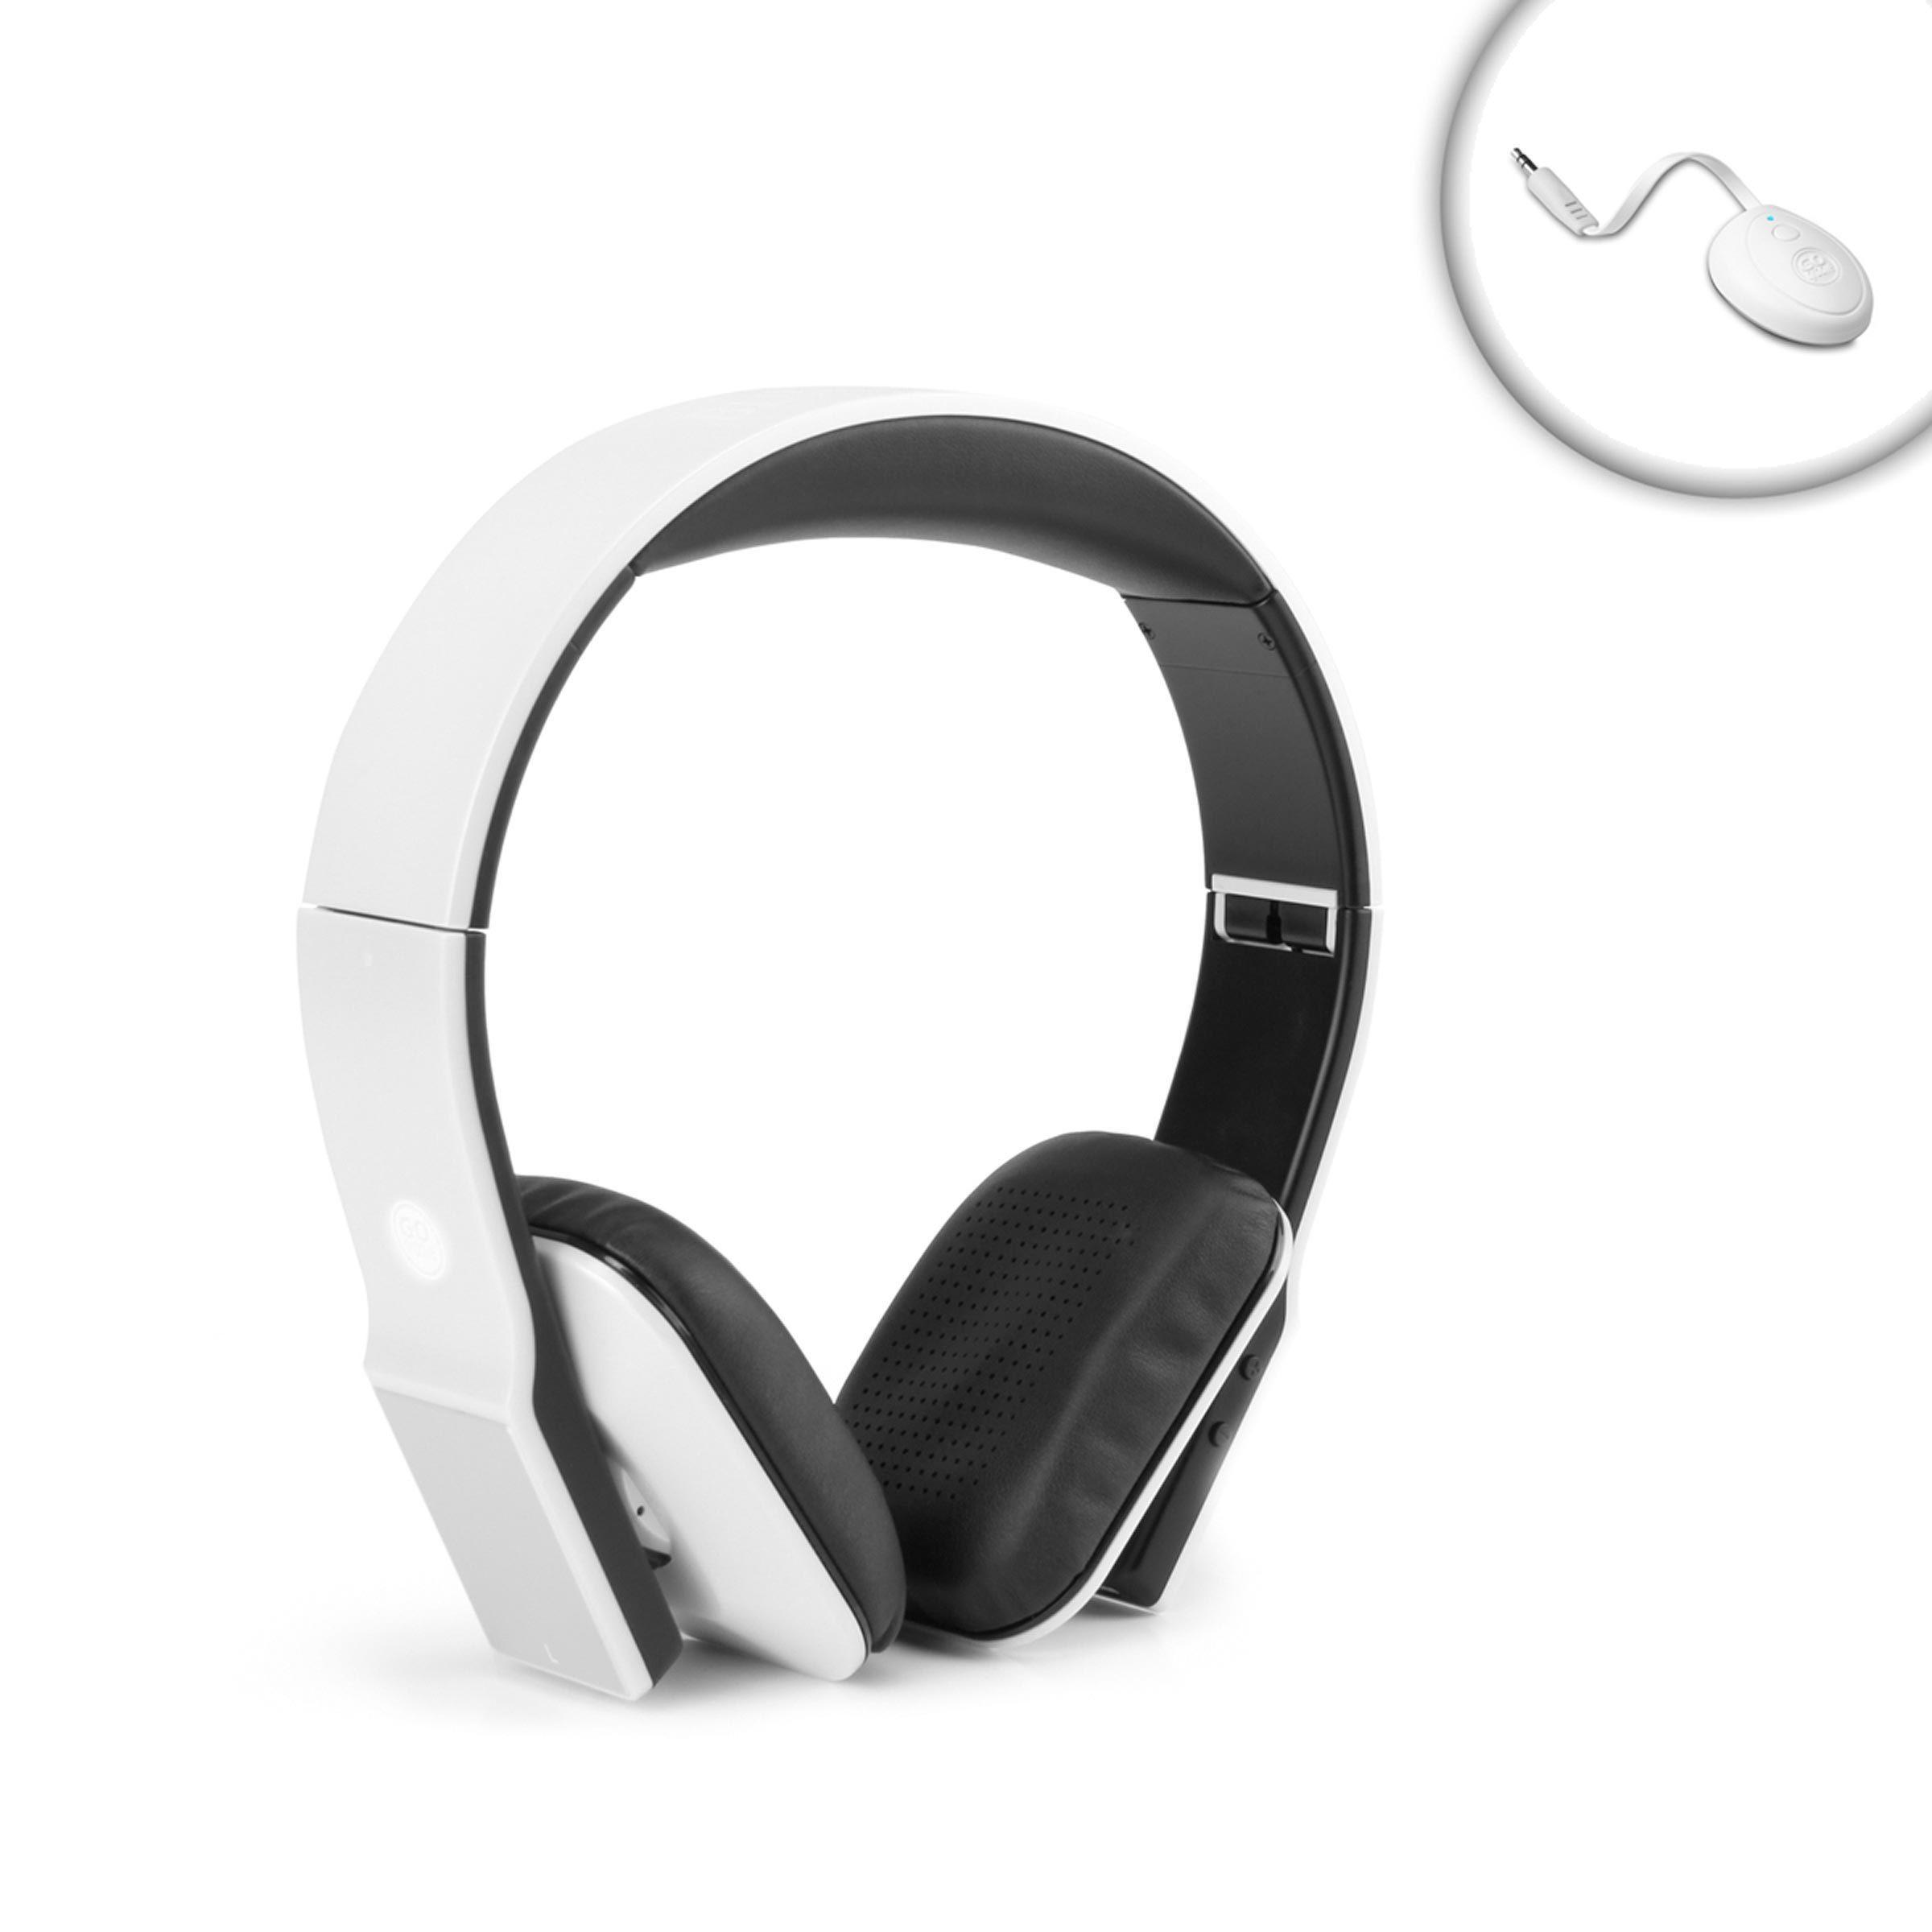 Sony GOgroove Bluetooth TV Headphones Wireless Connection...